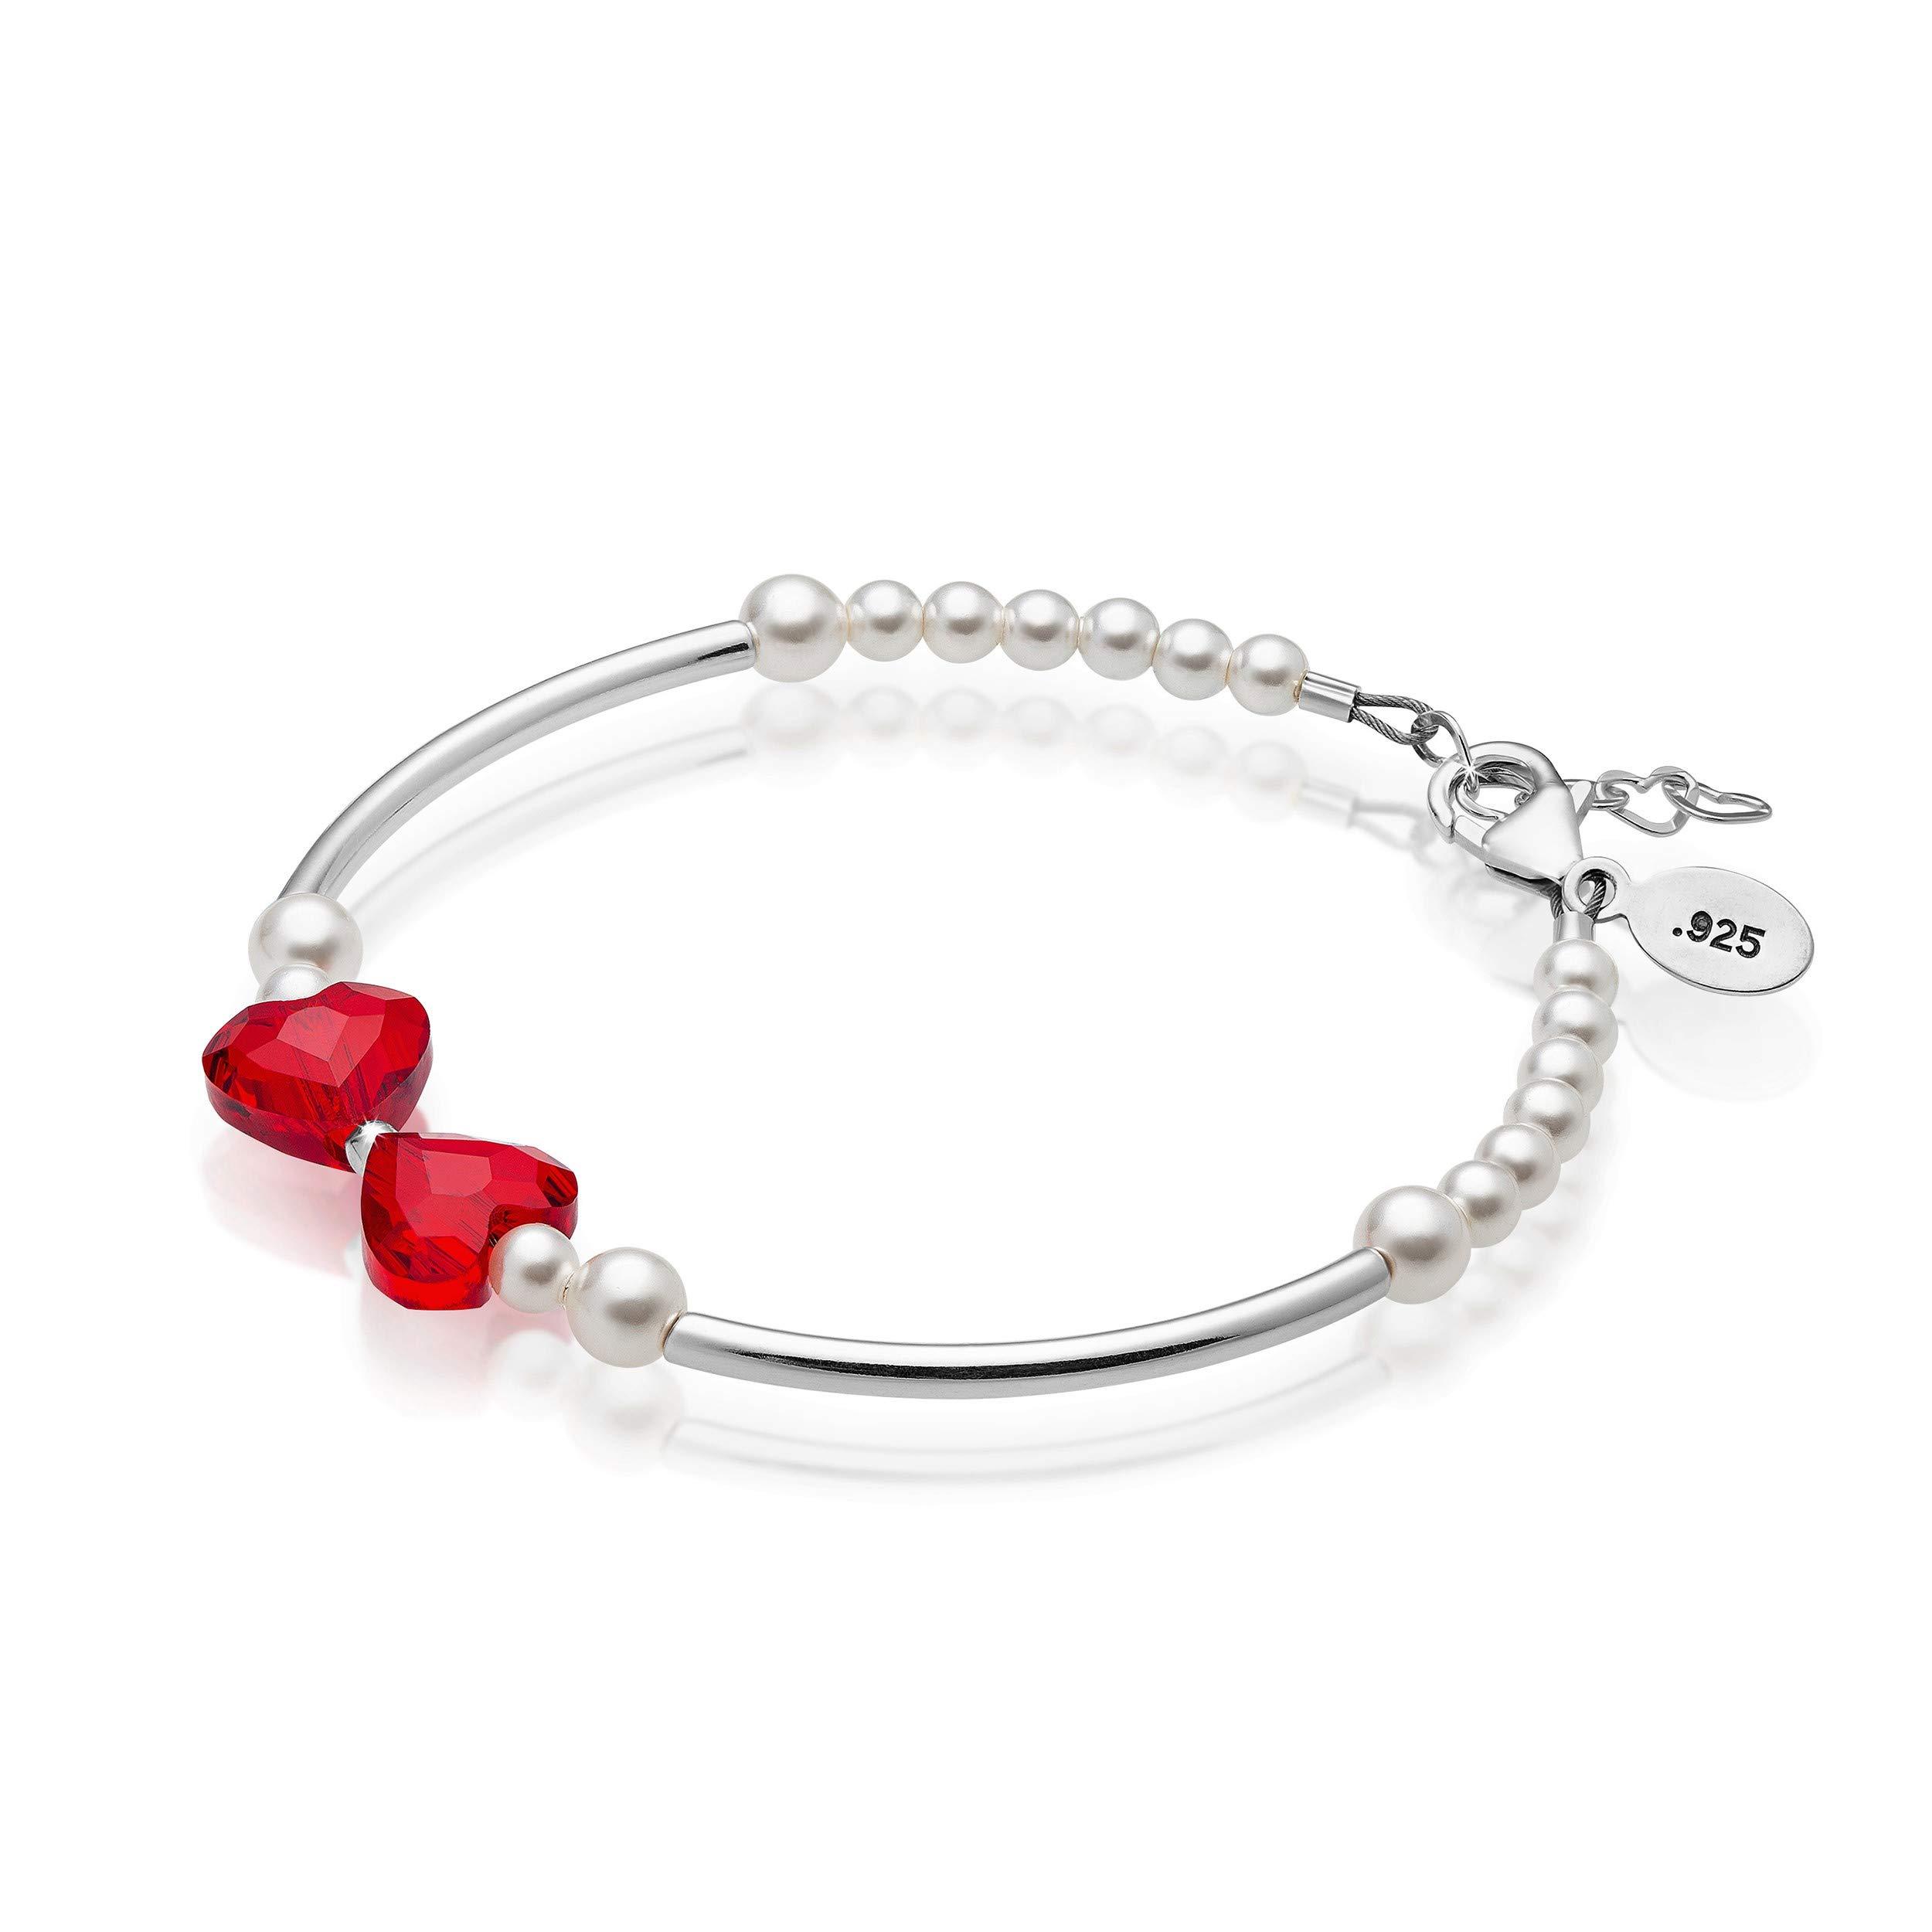 Baby Crystals Sterling Silver Bangles - Charm Bracelets for Girls - Baby Bangles for Girls with Swarovski Heart Crystal - Baby keepsake Gifts - Adjustable Bracelets (3-18 Months)